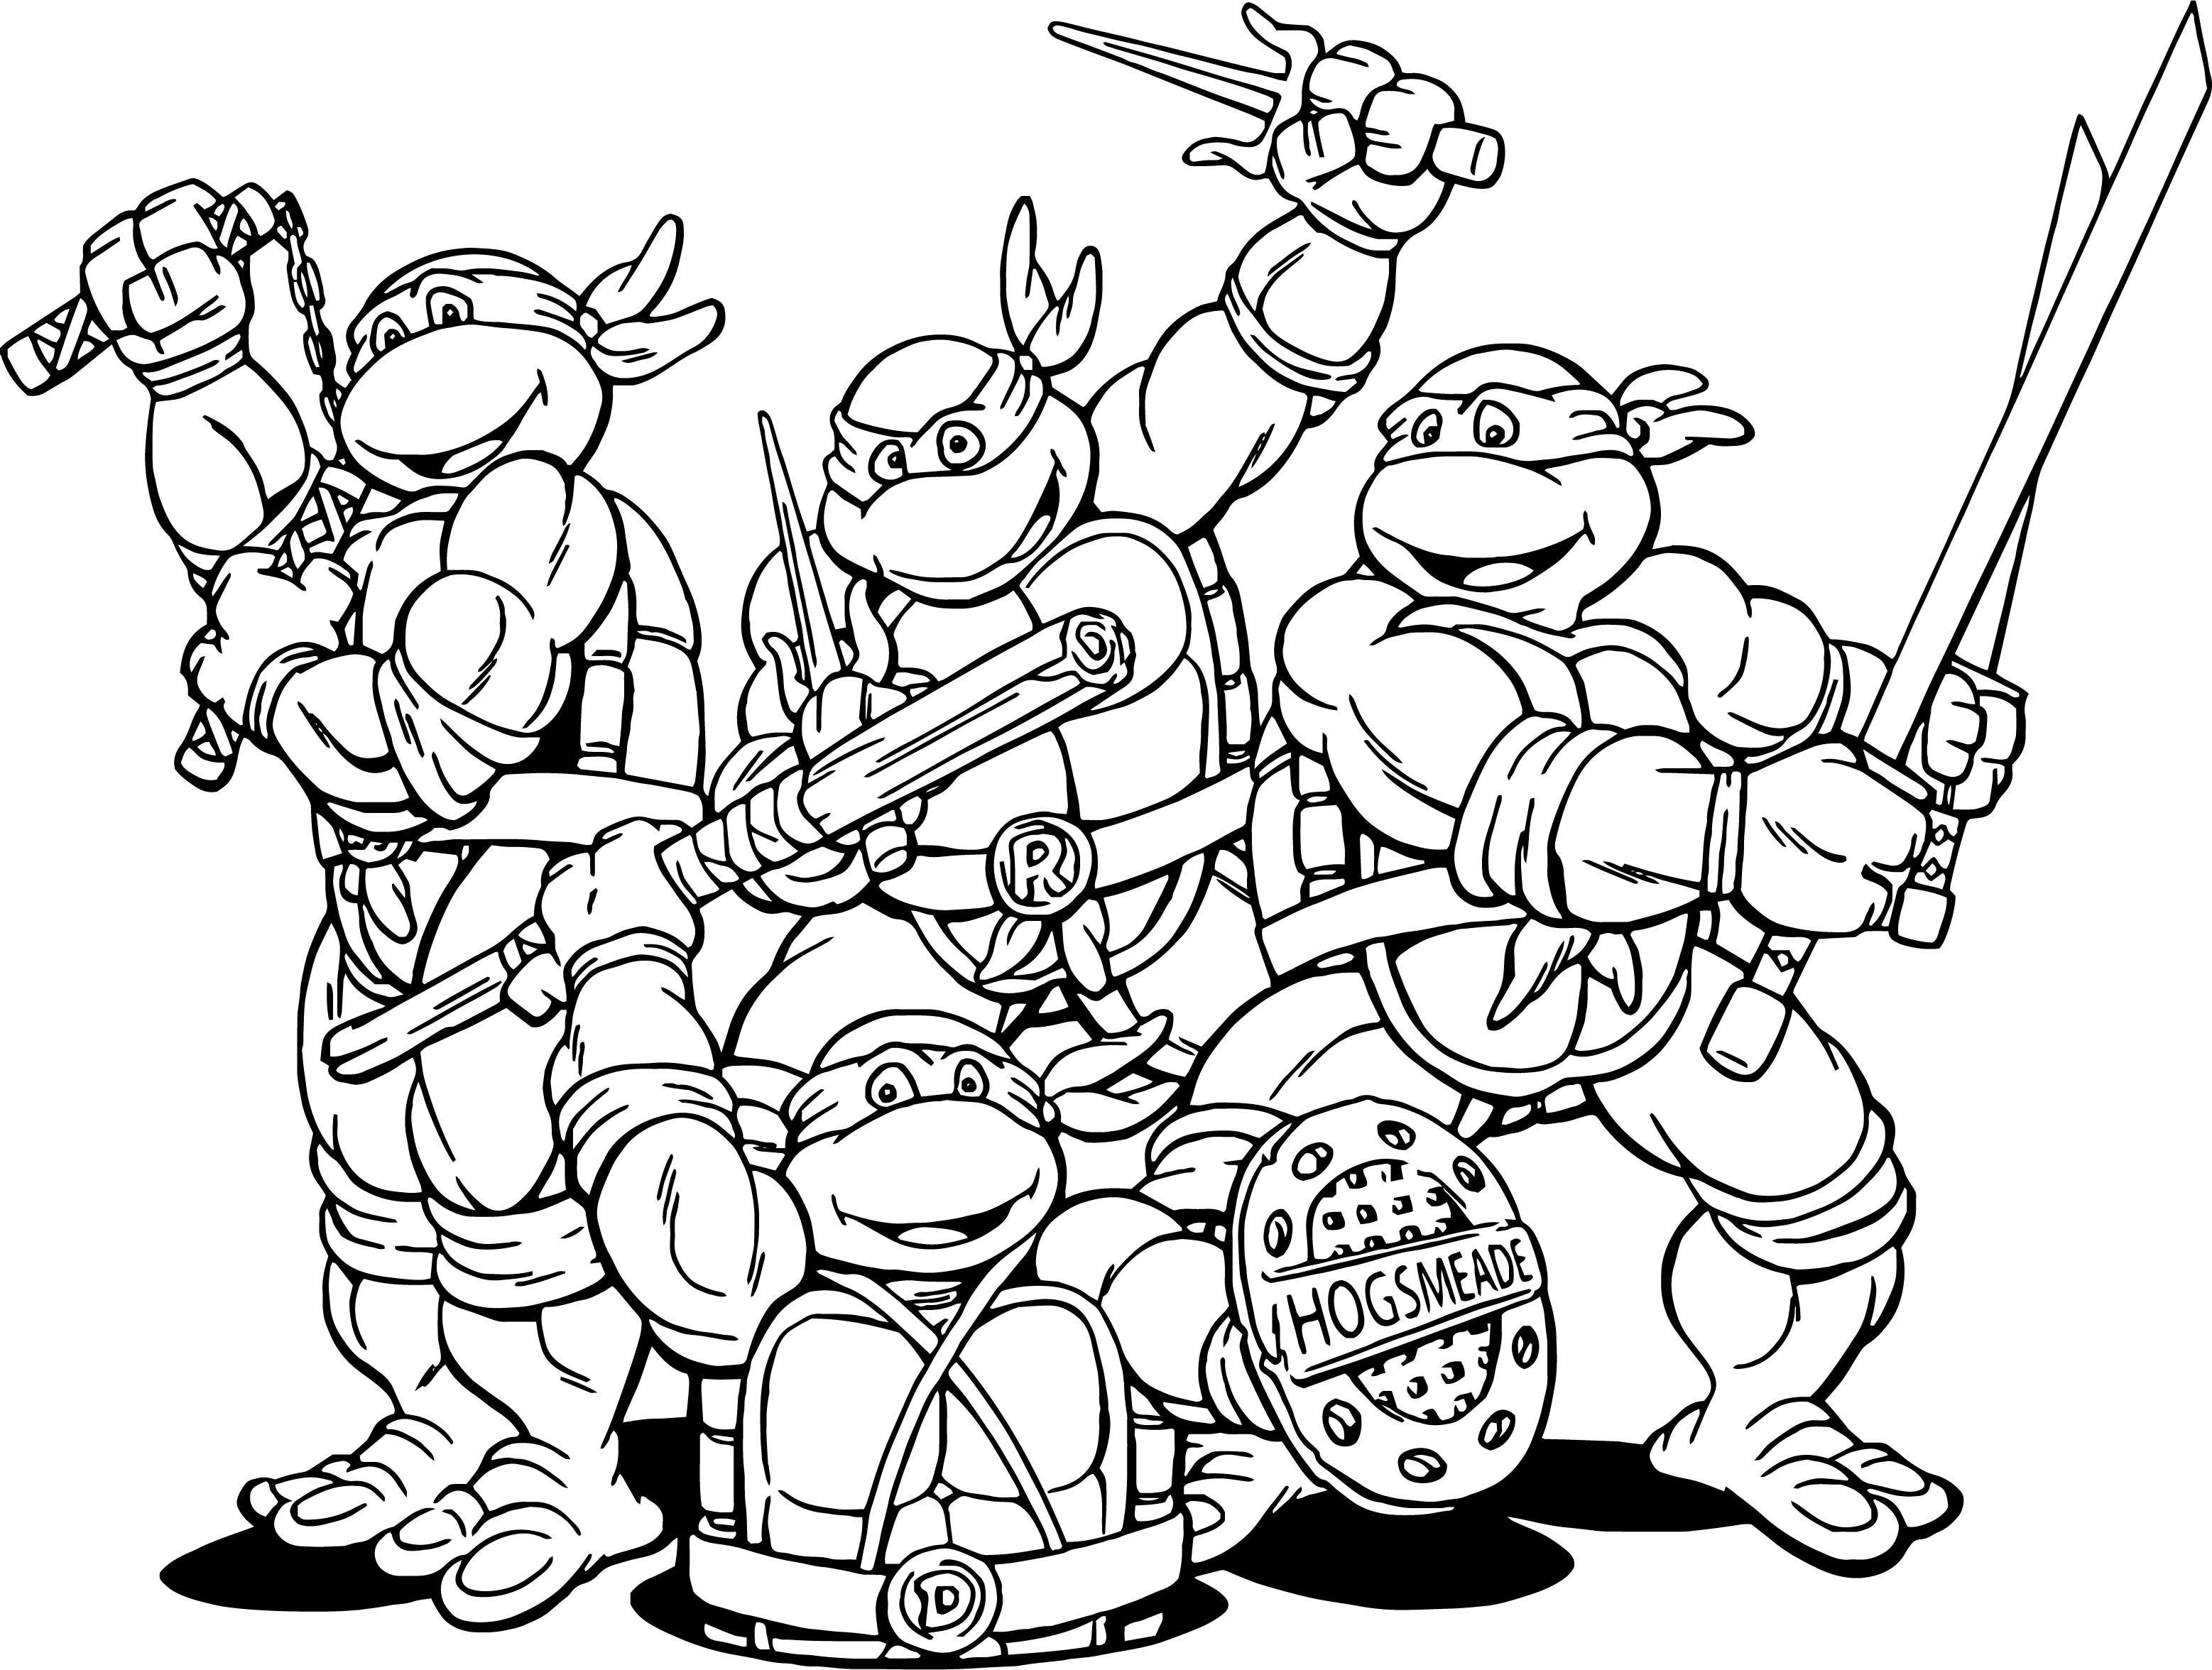 Teenage Mutant Ninja Turtles Coloring Book  Teenage Mutant Ninja Turtles Cartoon Coloring Page